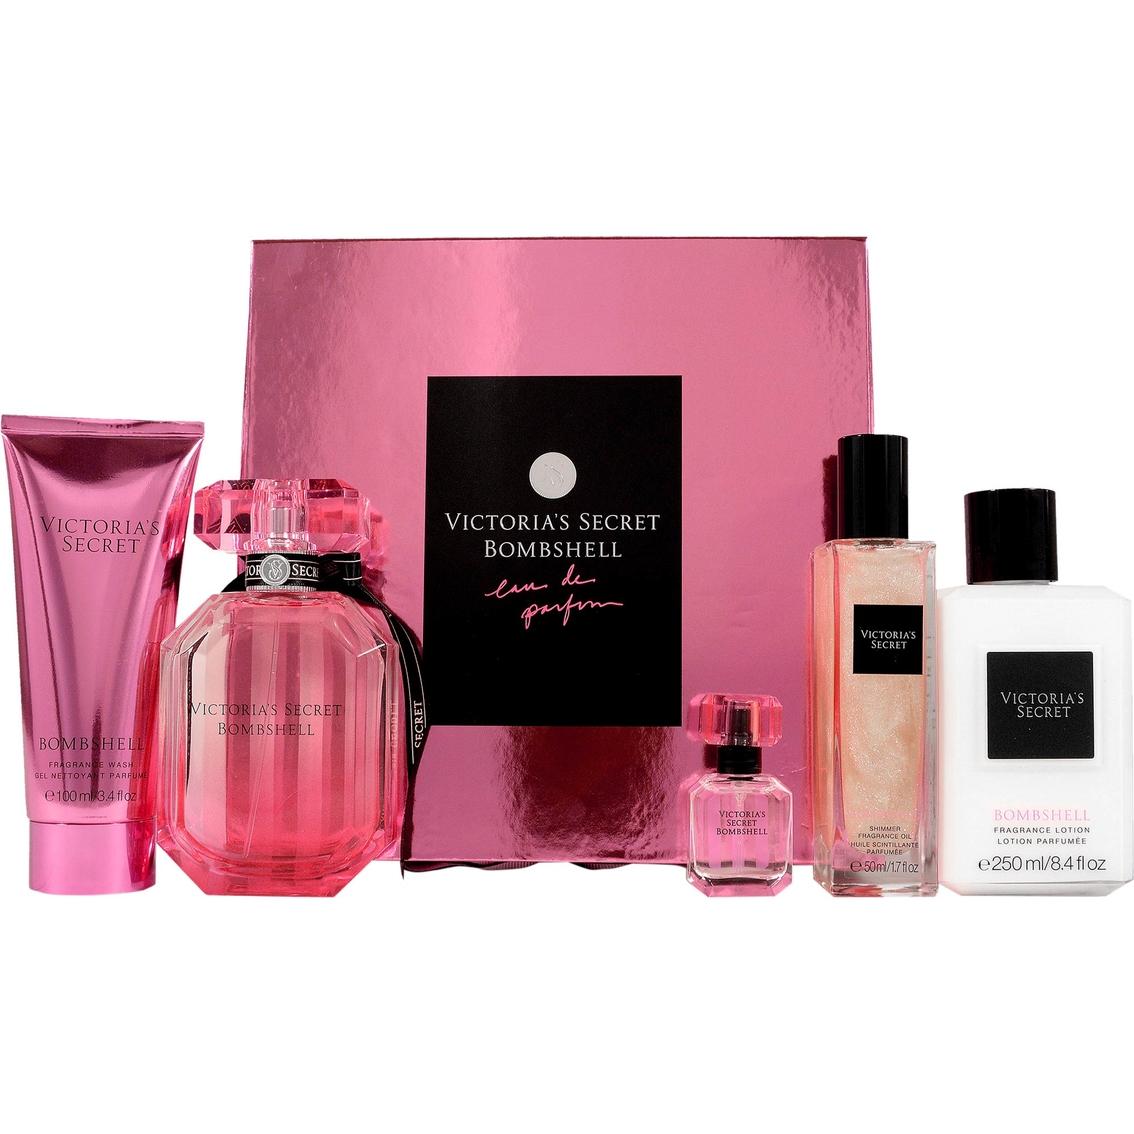 8d7cbe7e7686d Victoria's Secret Bombshell Large Fragrance Box | Women's Fragrances ...